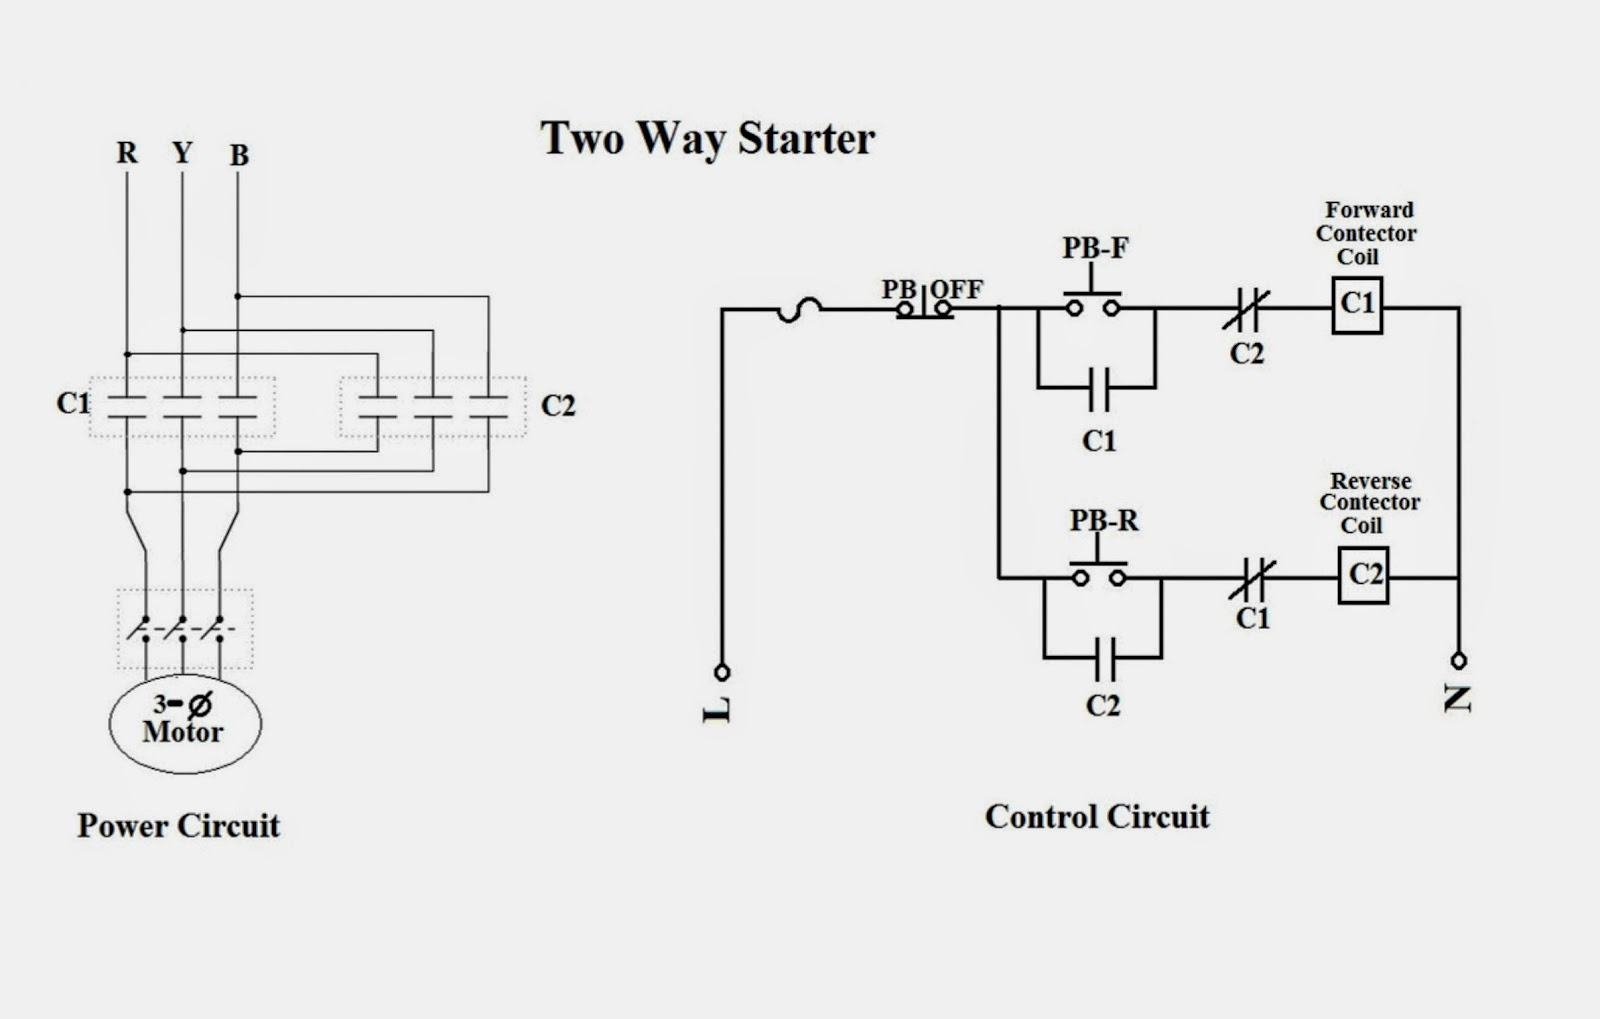 300zx hks turbo timer wiring diagram wiring libraryturbo timer wiring diagram training report on bokaro steel [ 1600 x 1019 Pixel ]